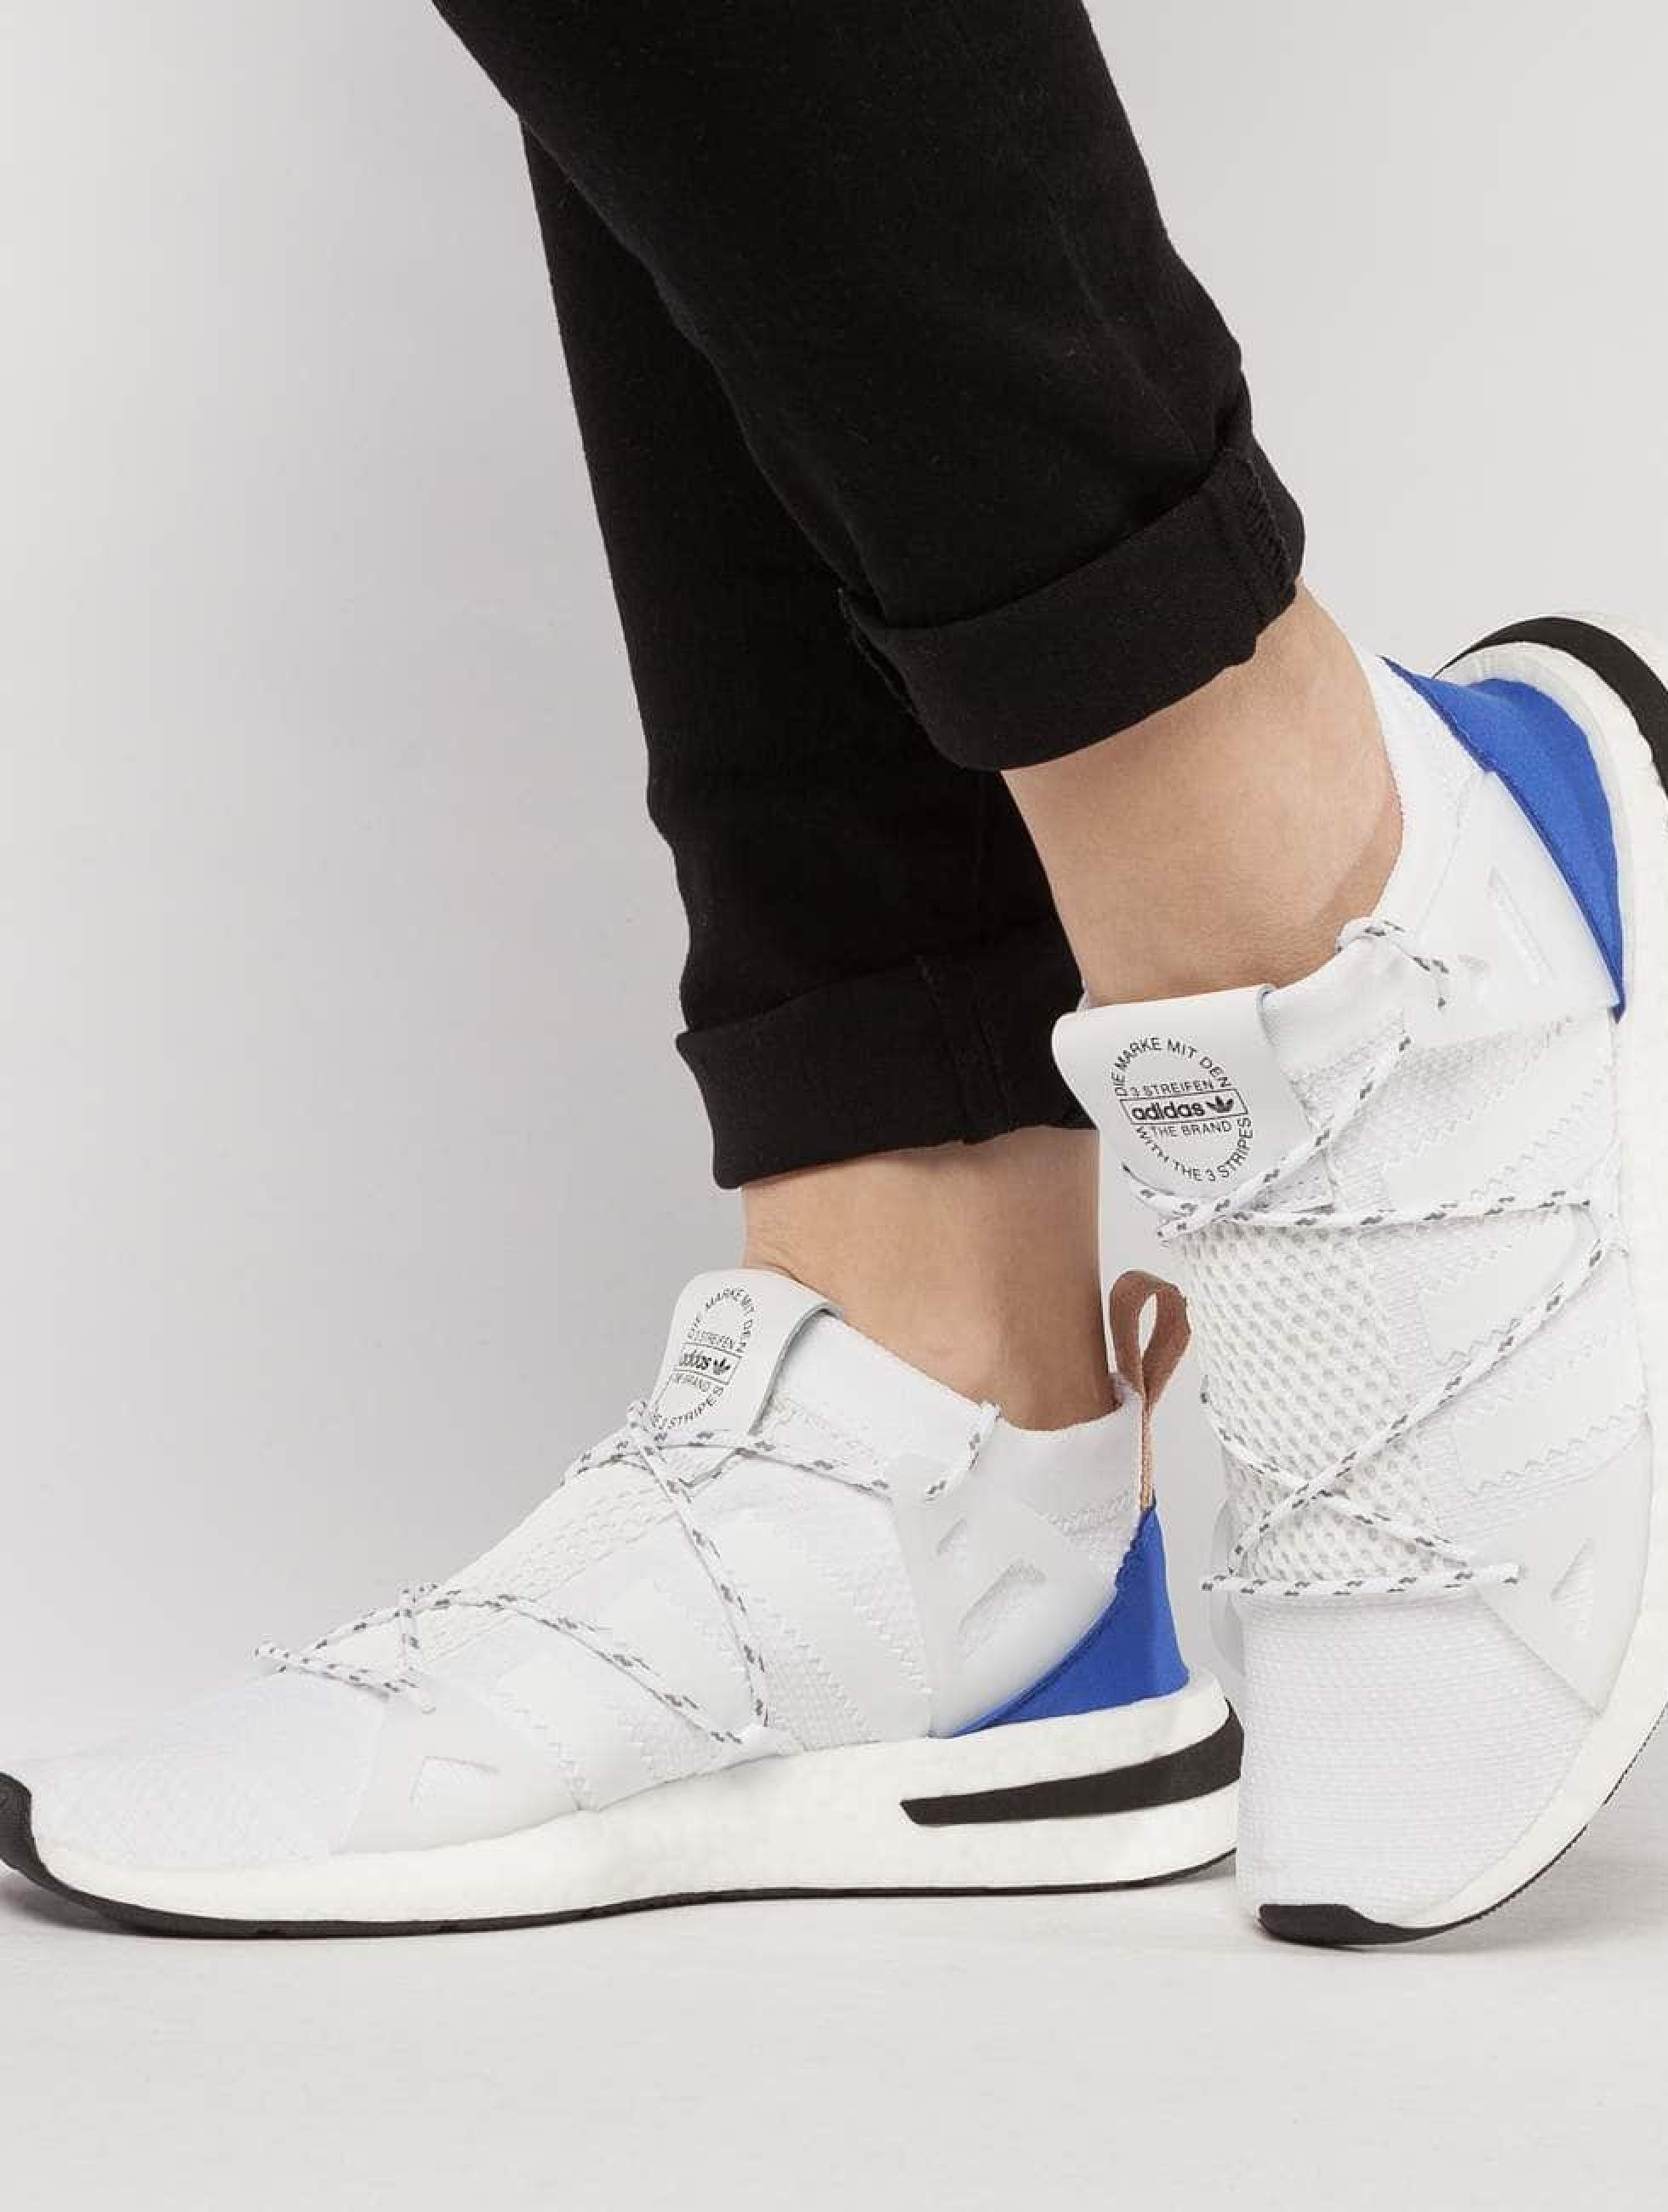 adidas originals Damen Schuhe / Sneaker Arkyn W